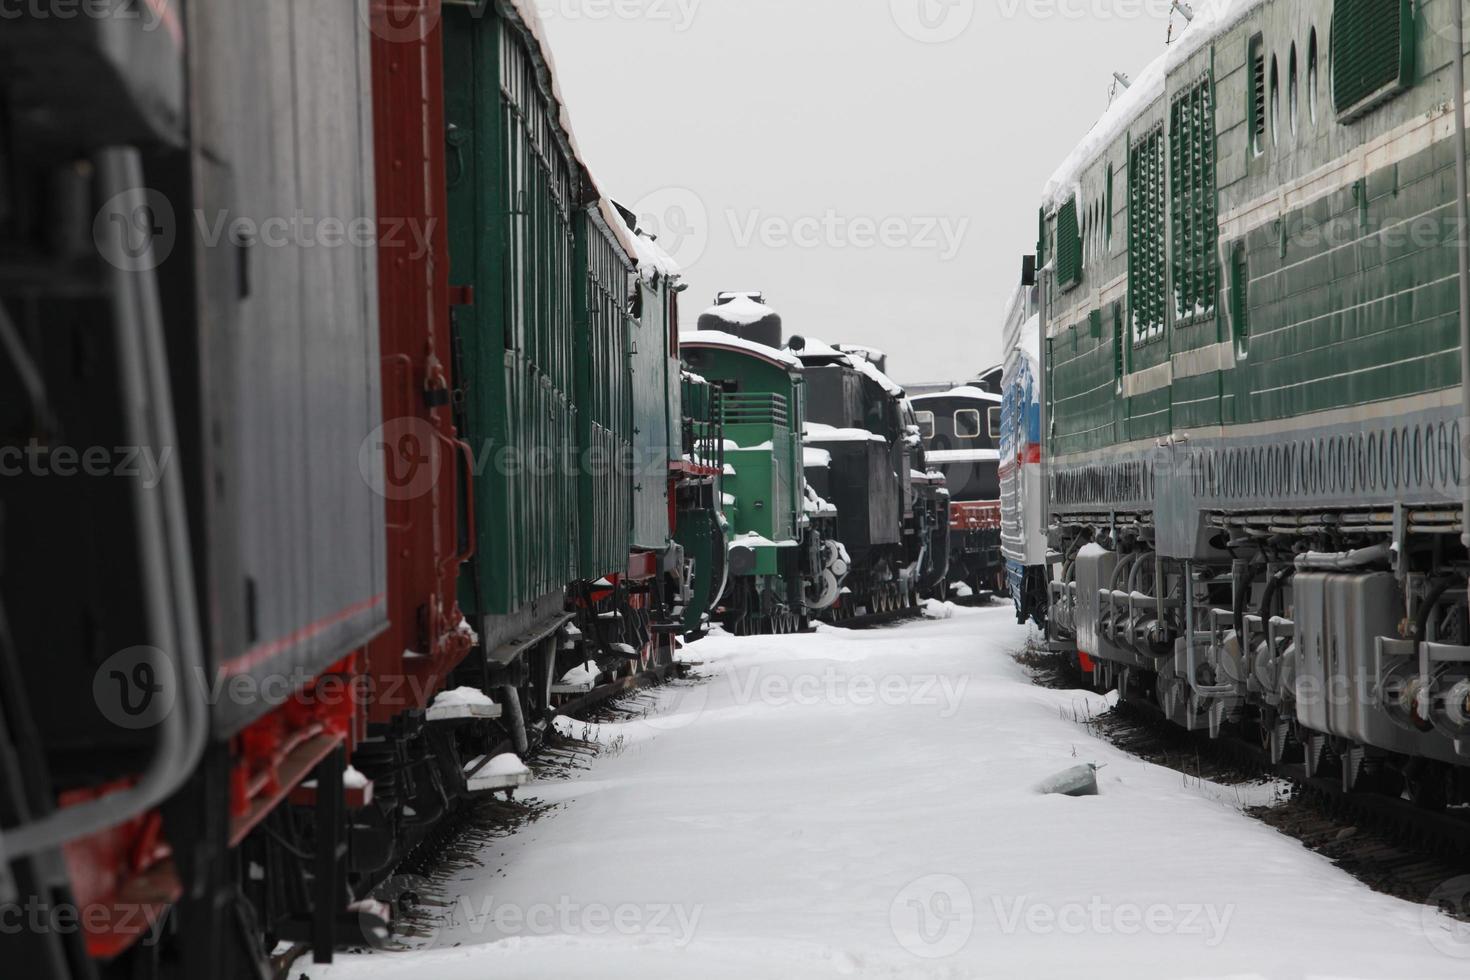 gare en hiver photo